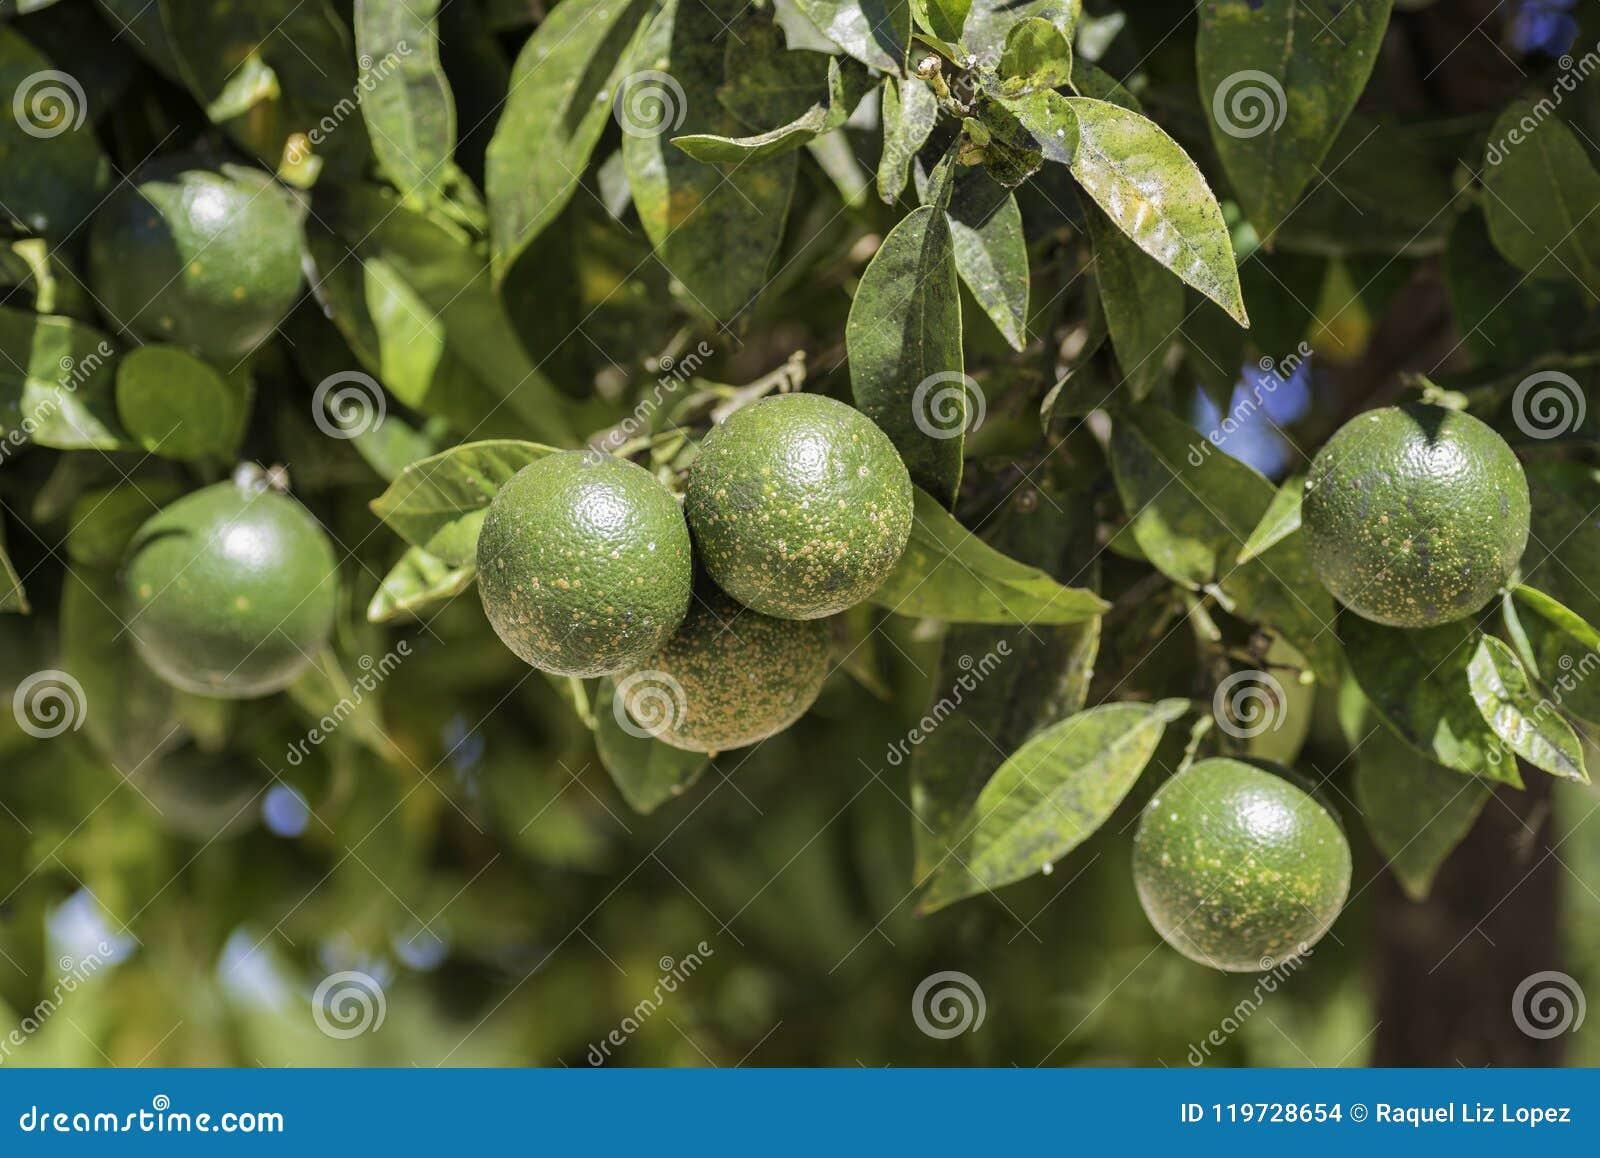 Dettaglio all arance verdi